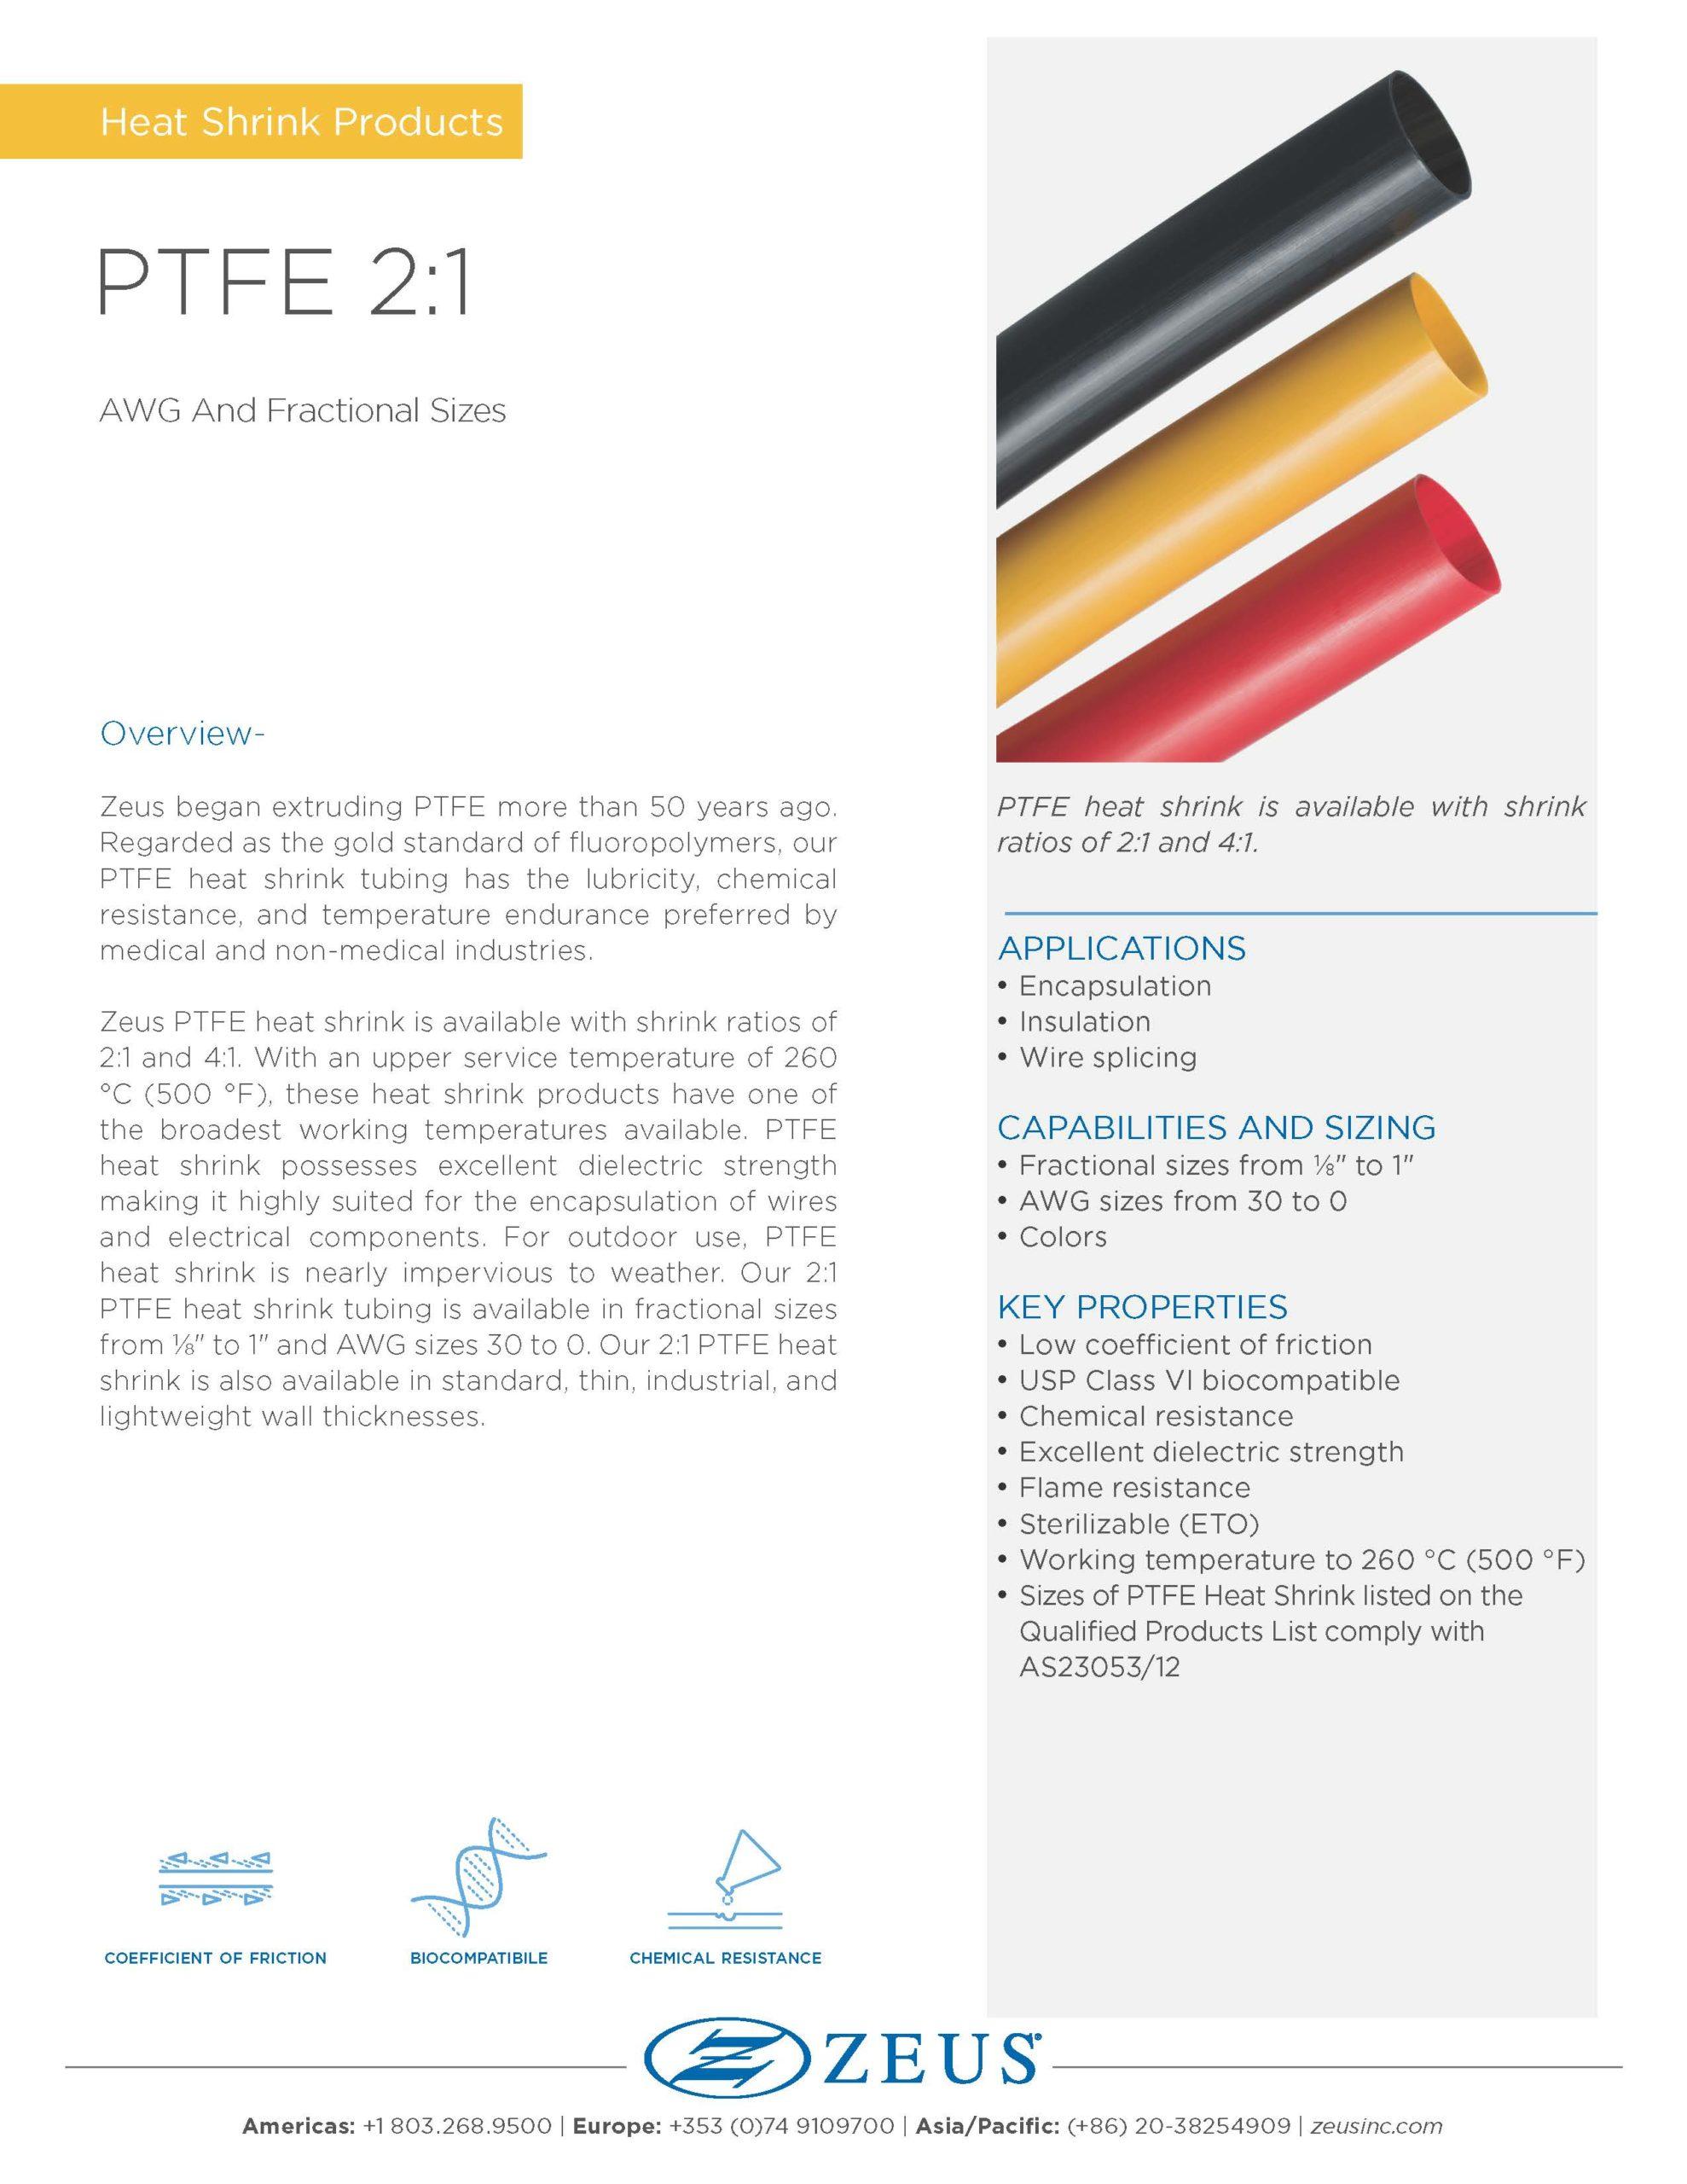 PTFE 21 Heat Shrink